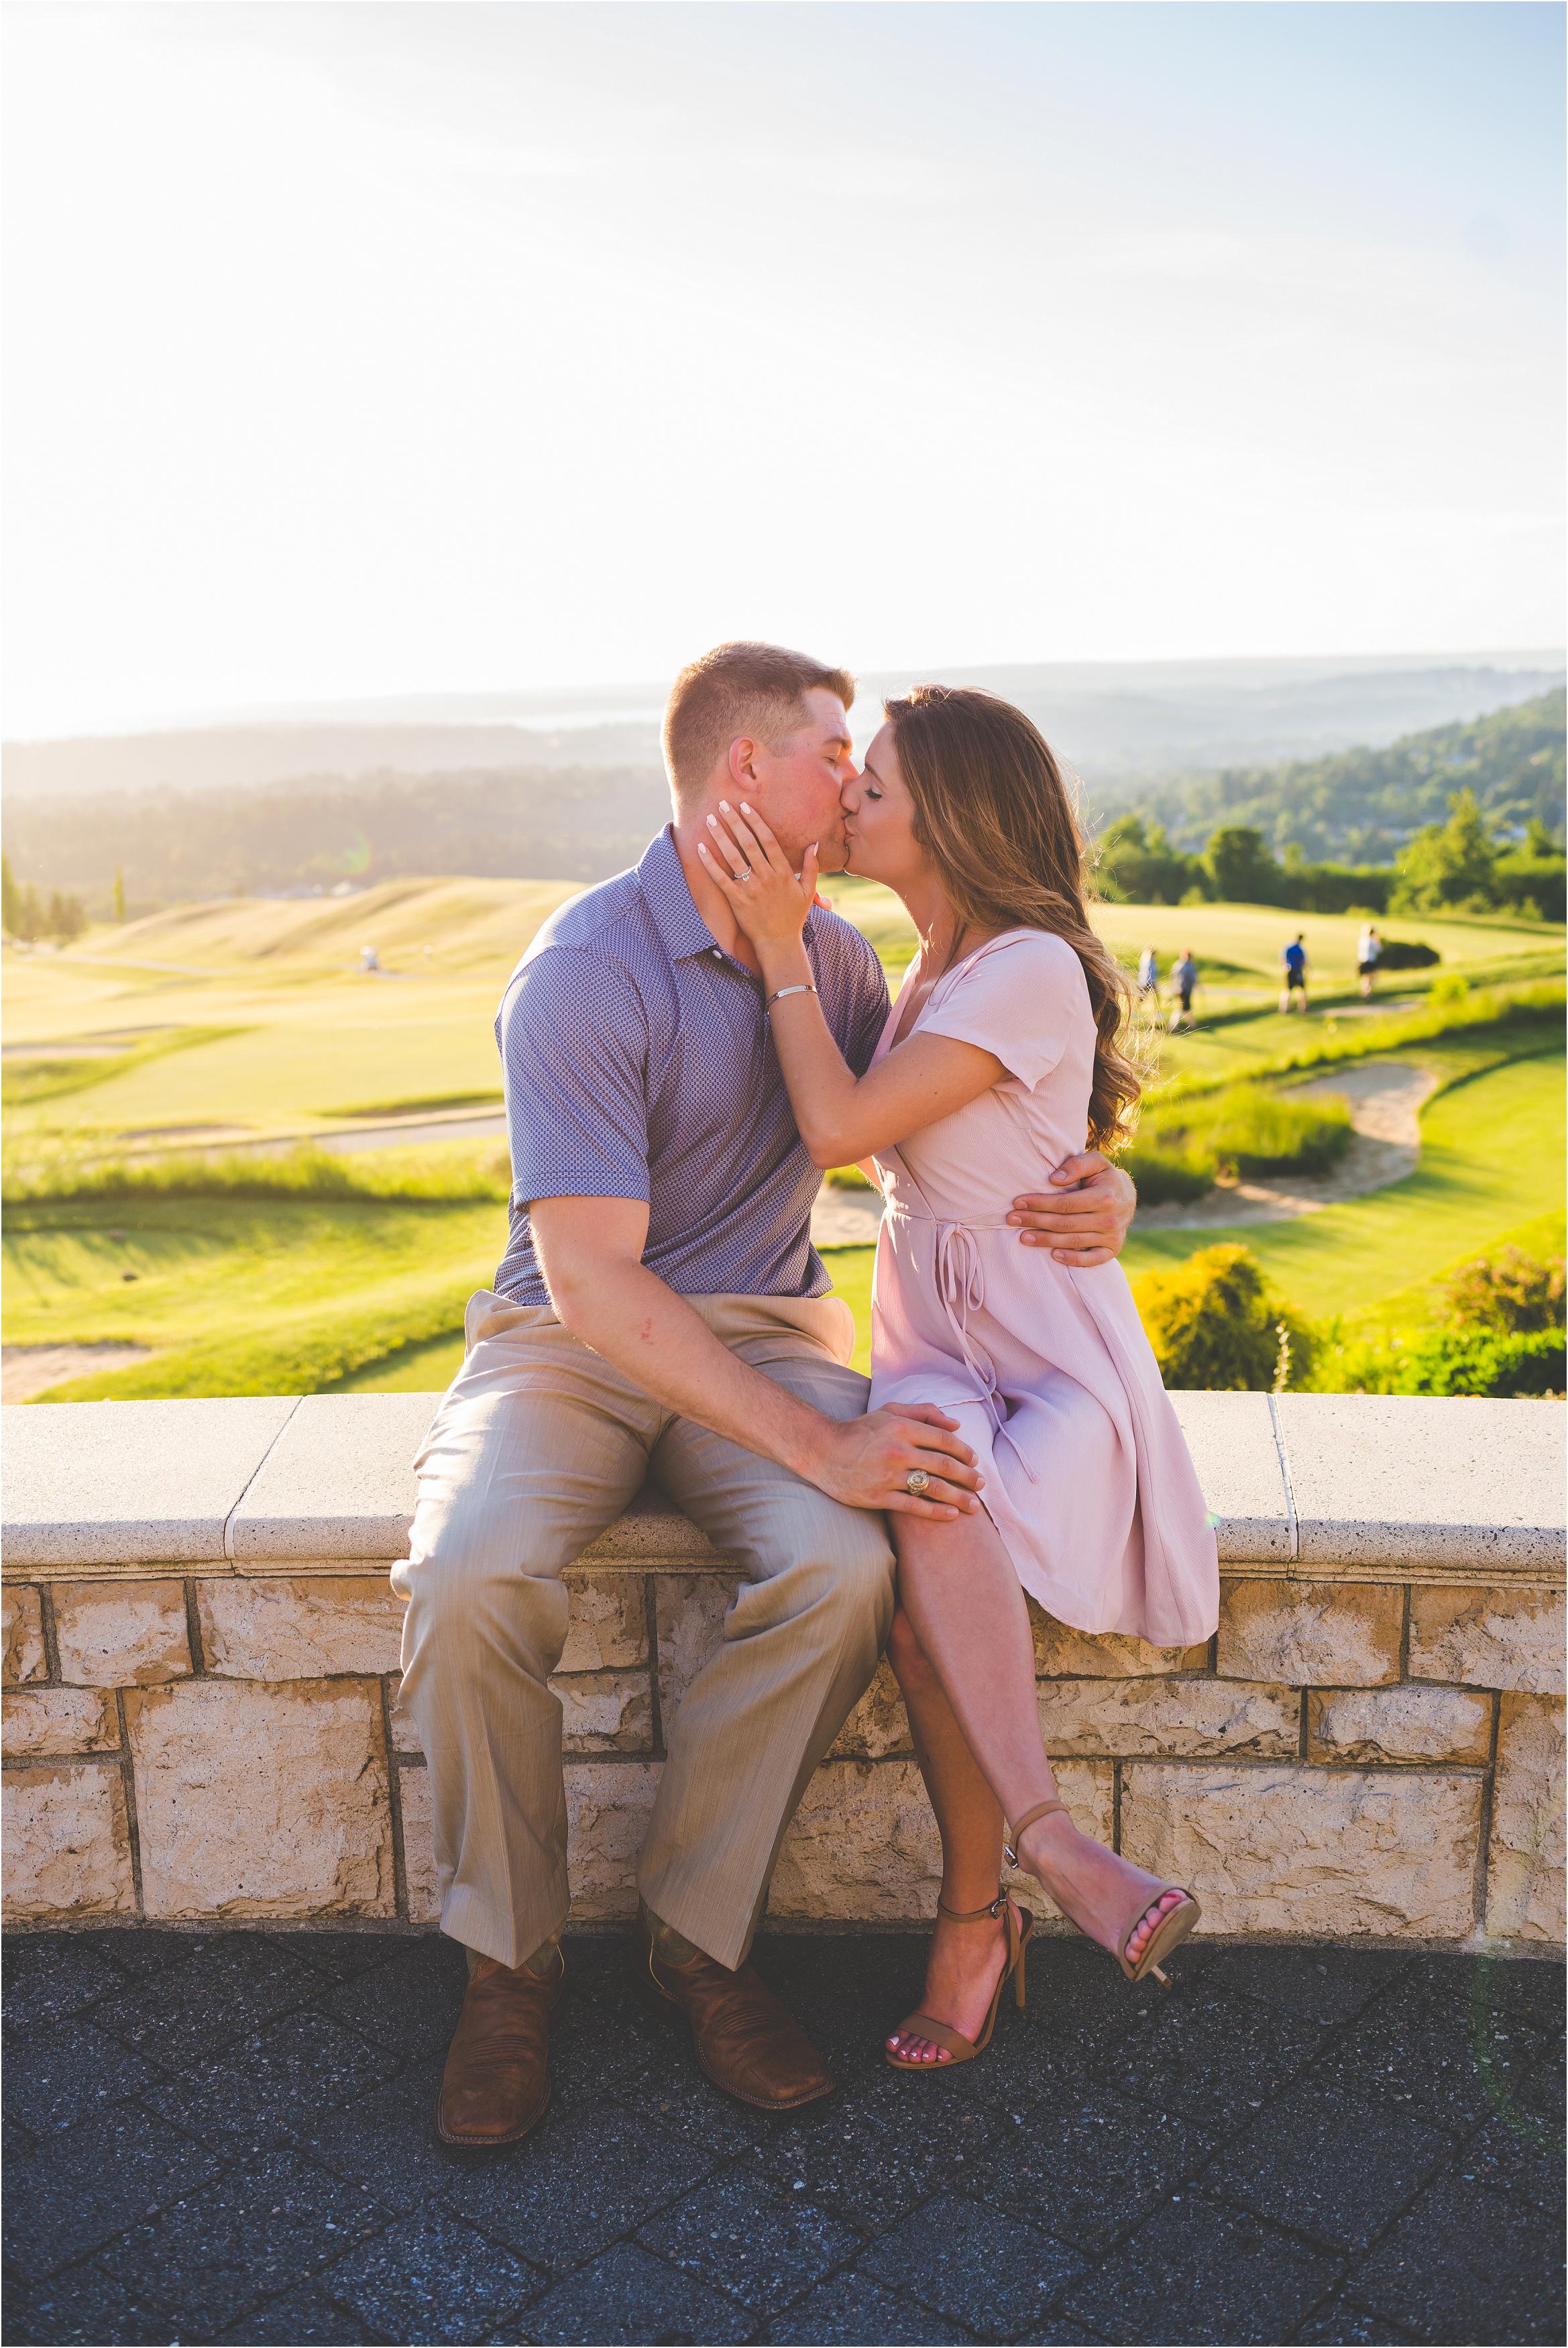 newcastle-golf-club-proposal-jannicka-mayte-seattle-washington-engagement-wedding-photographer_0052.jpg